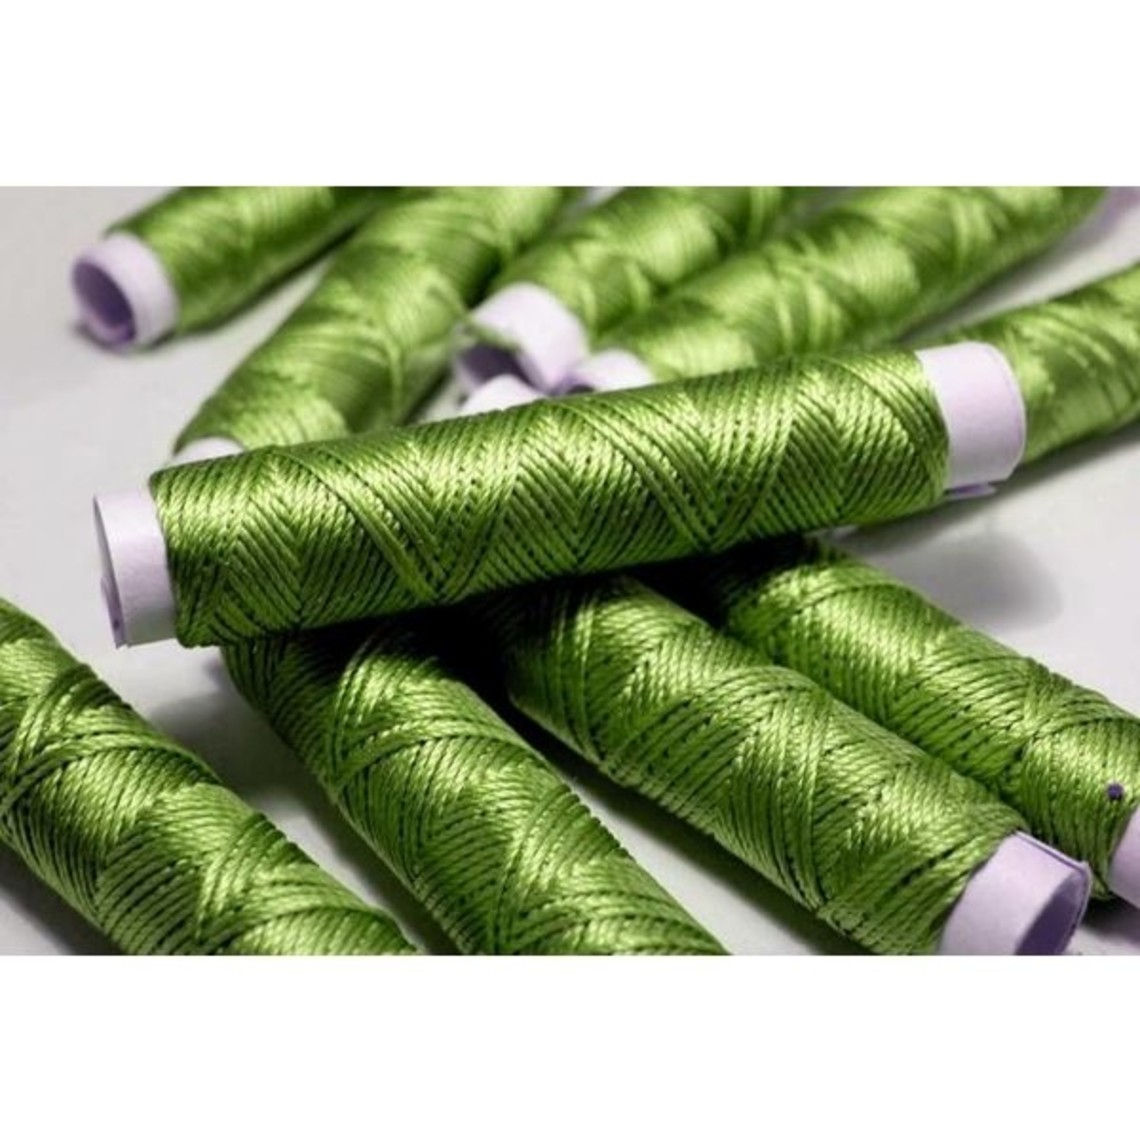 Nićmi Emerald zielony, 10 m